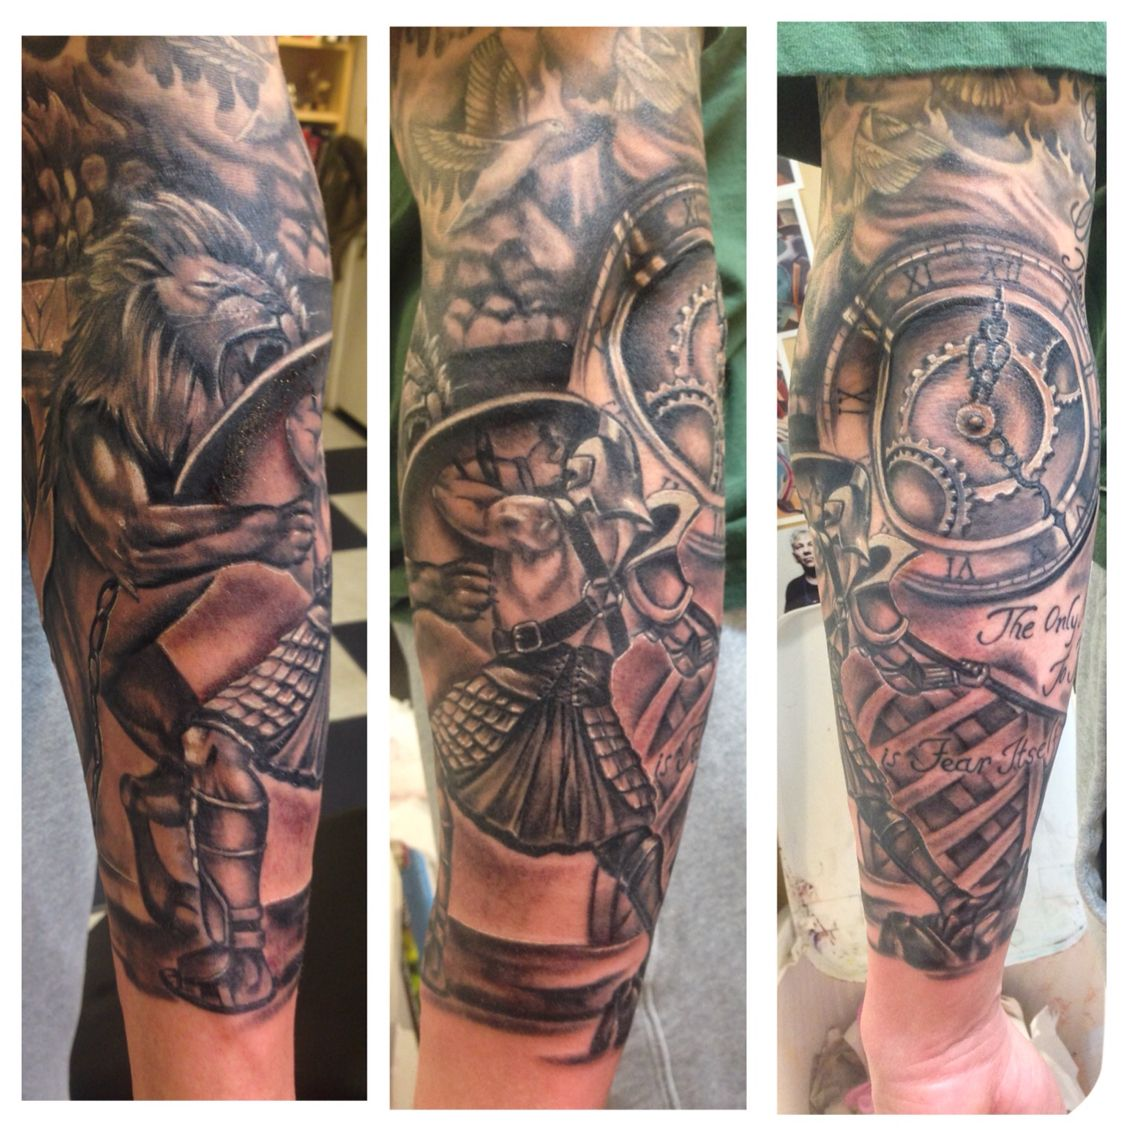 mark 39 s black and gray gladiator half sleeve tattoos pinterest men tattoos designs tattoo. Black Bedroom Furniture Sets. Home Design Ideas